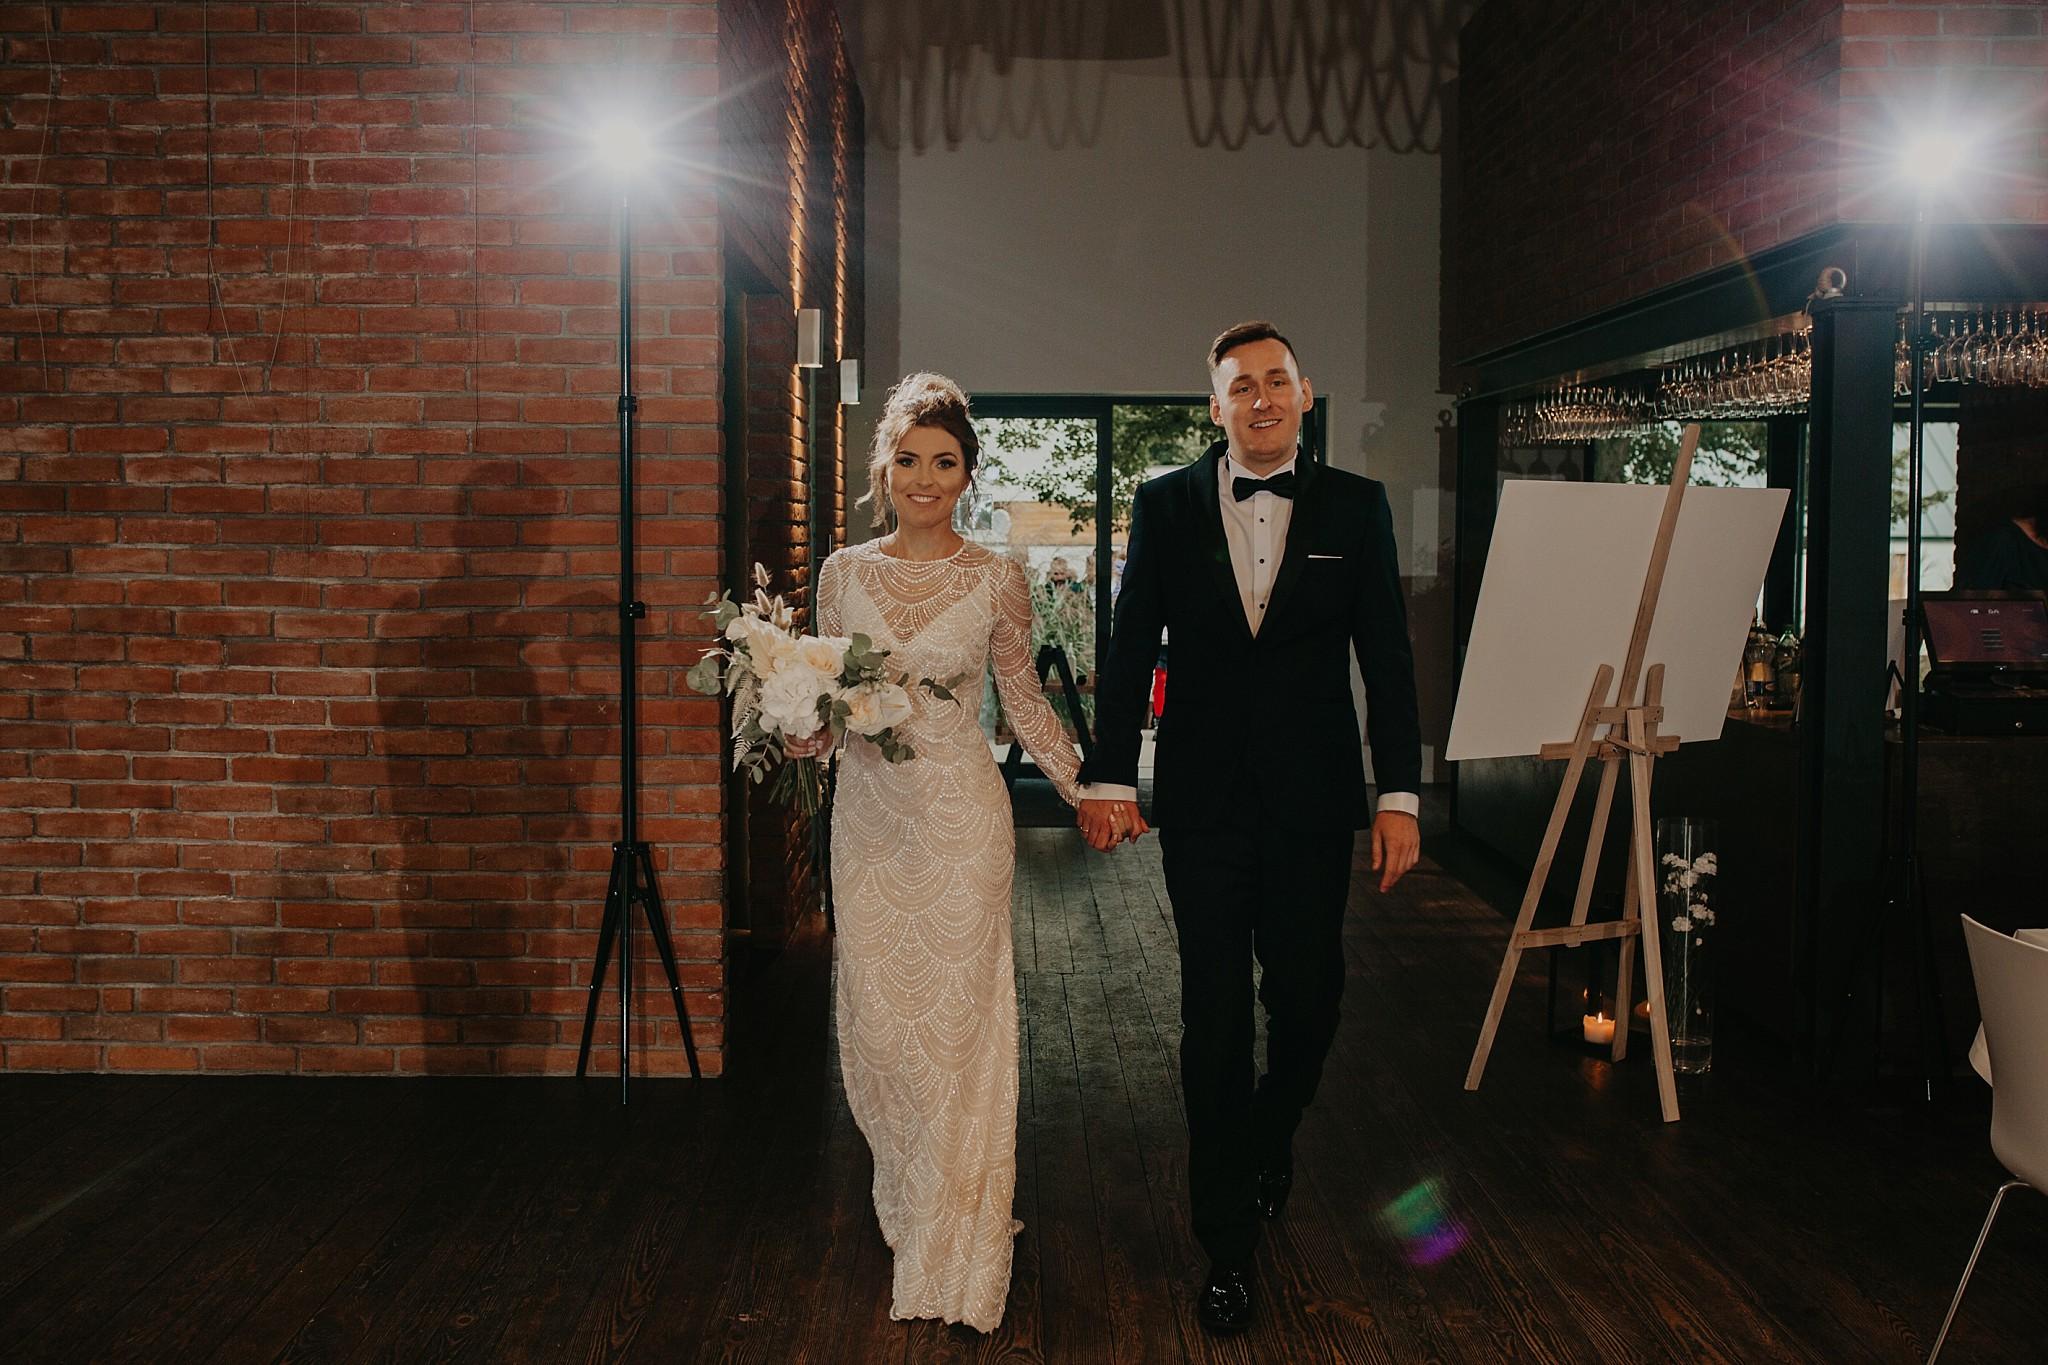 fotograf poznan wesele dobra truskawka piekne wesele pod poznaniem wesele w dobrej truskawce piekna para mloda slub marzen slub koronawirus slub listopad wesele koronawirus 269